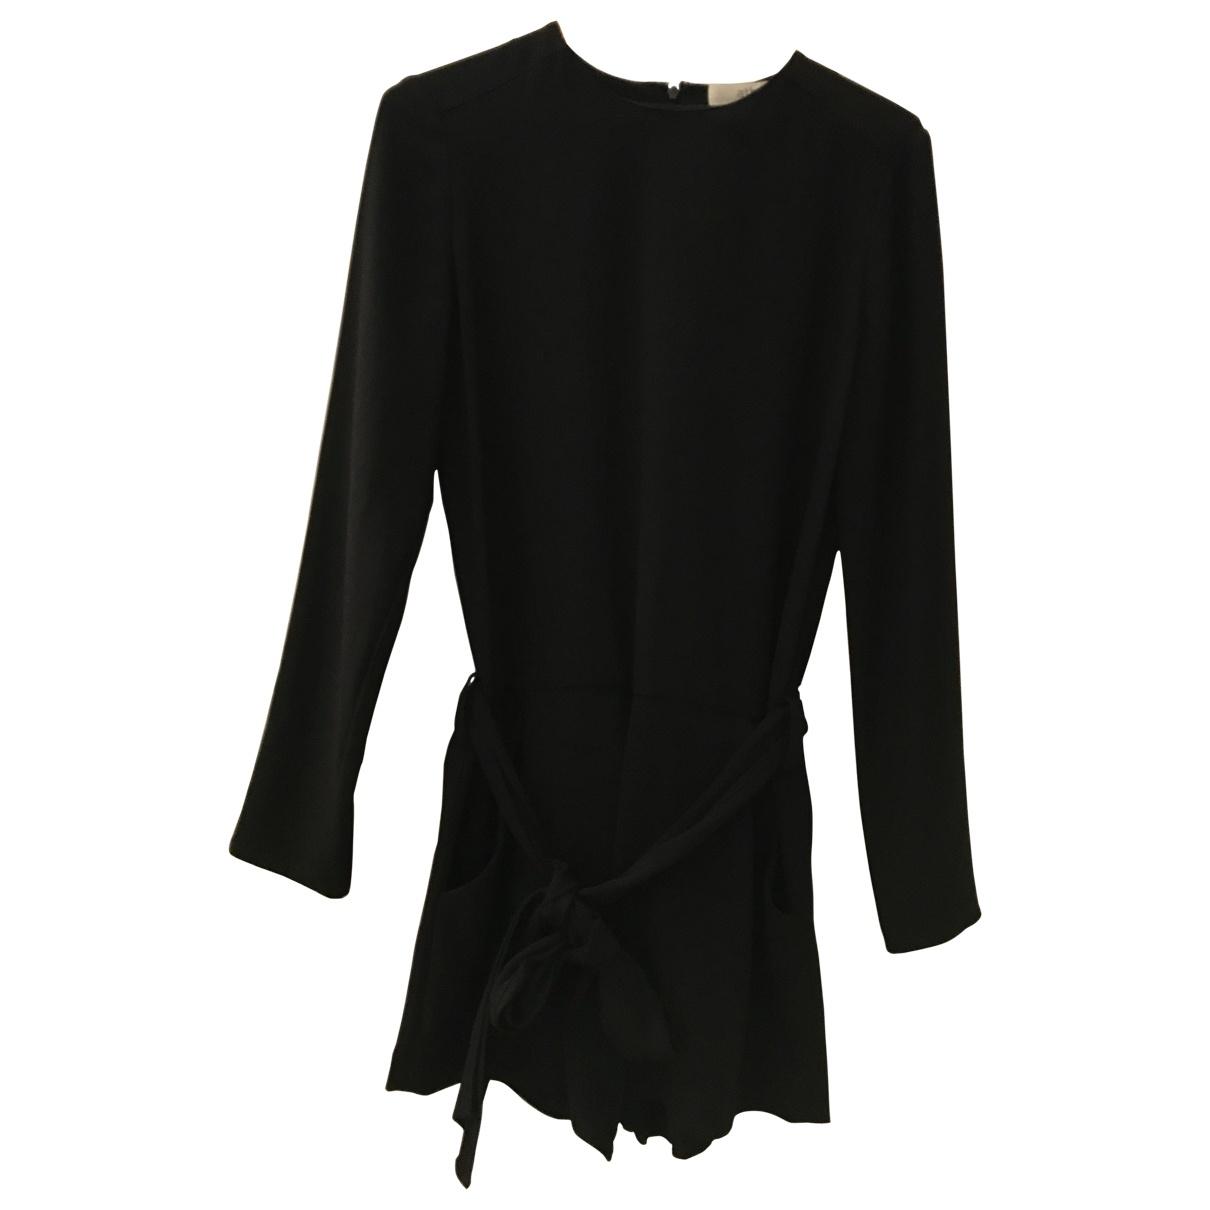 Vanessa Bruno Athe \N Black jumpsuit for Women 36 IT